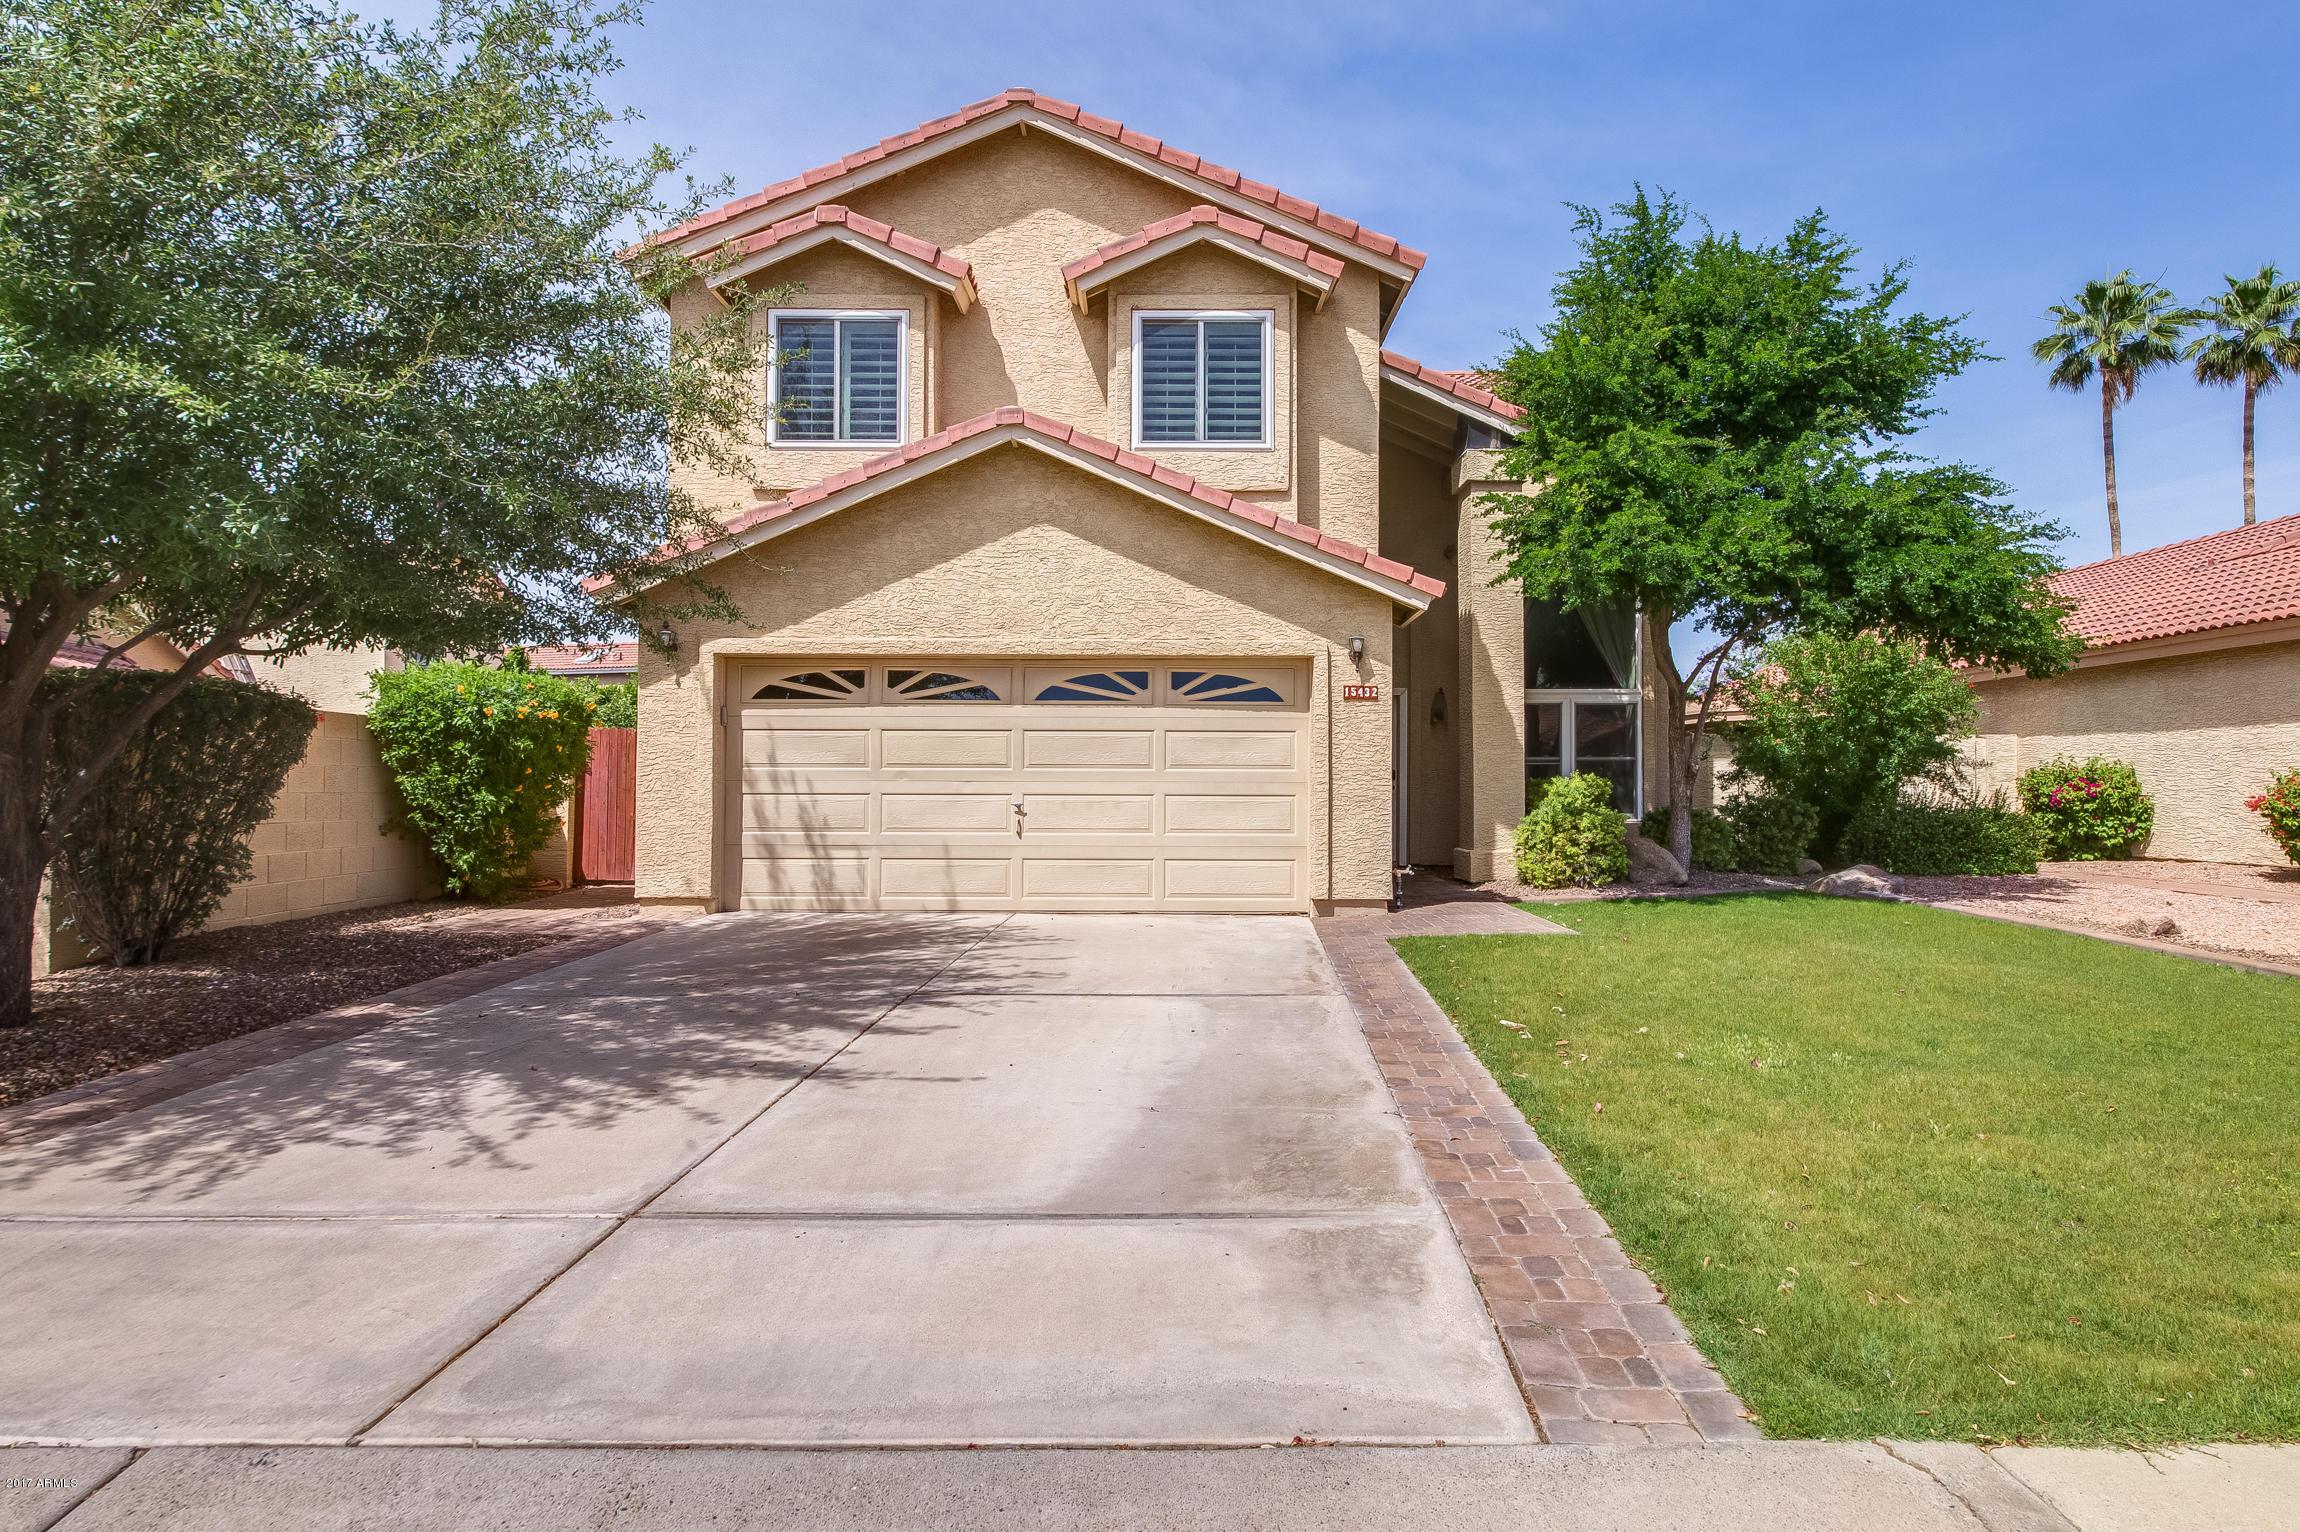 MLS 5909139 15432 S 37TH Street, Phoenix, AZ 85044 Phoenix (Ahwatukee) Homes for Rent